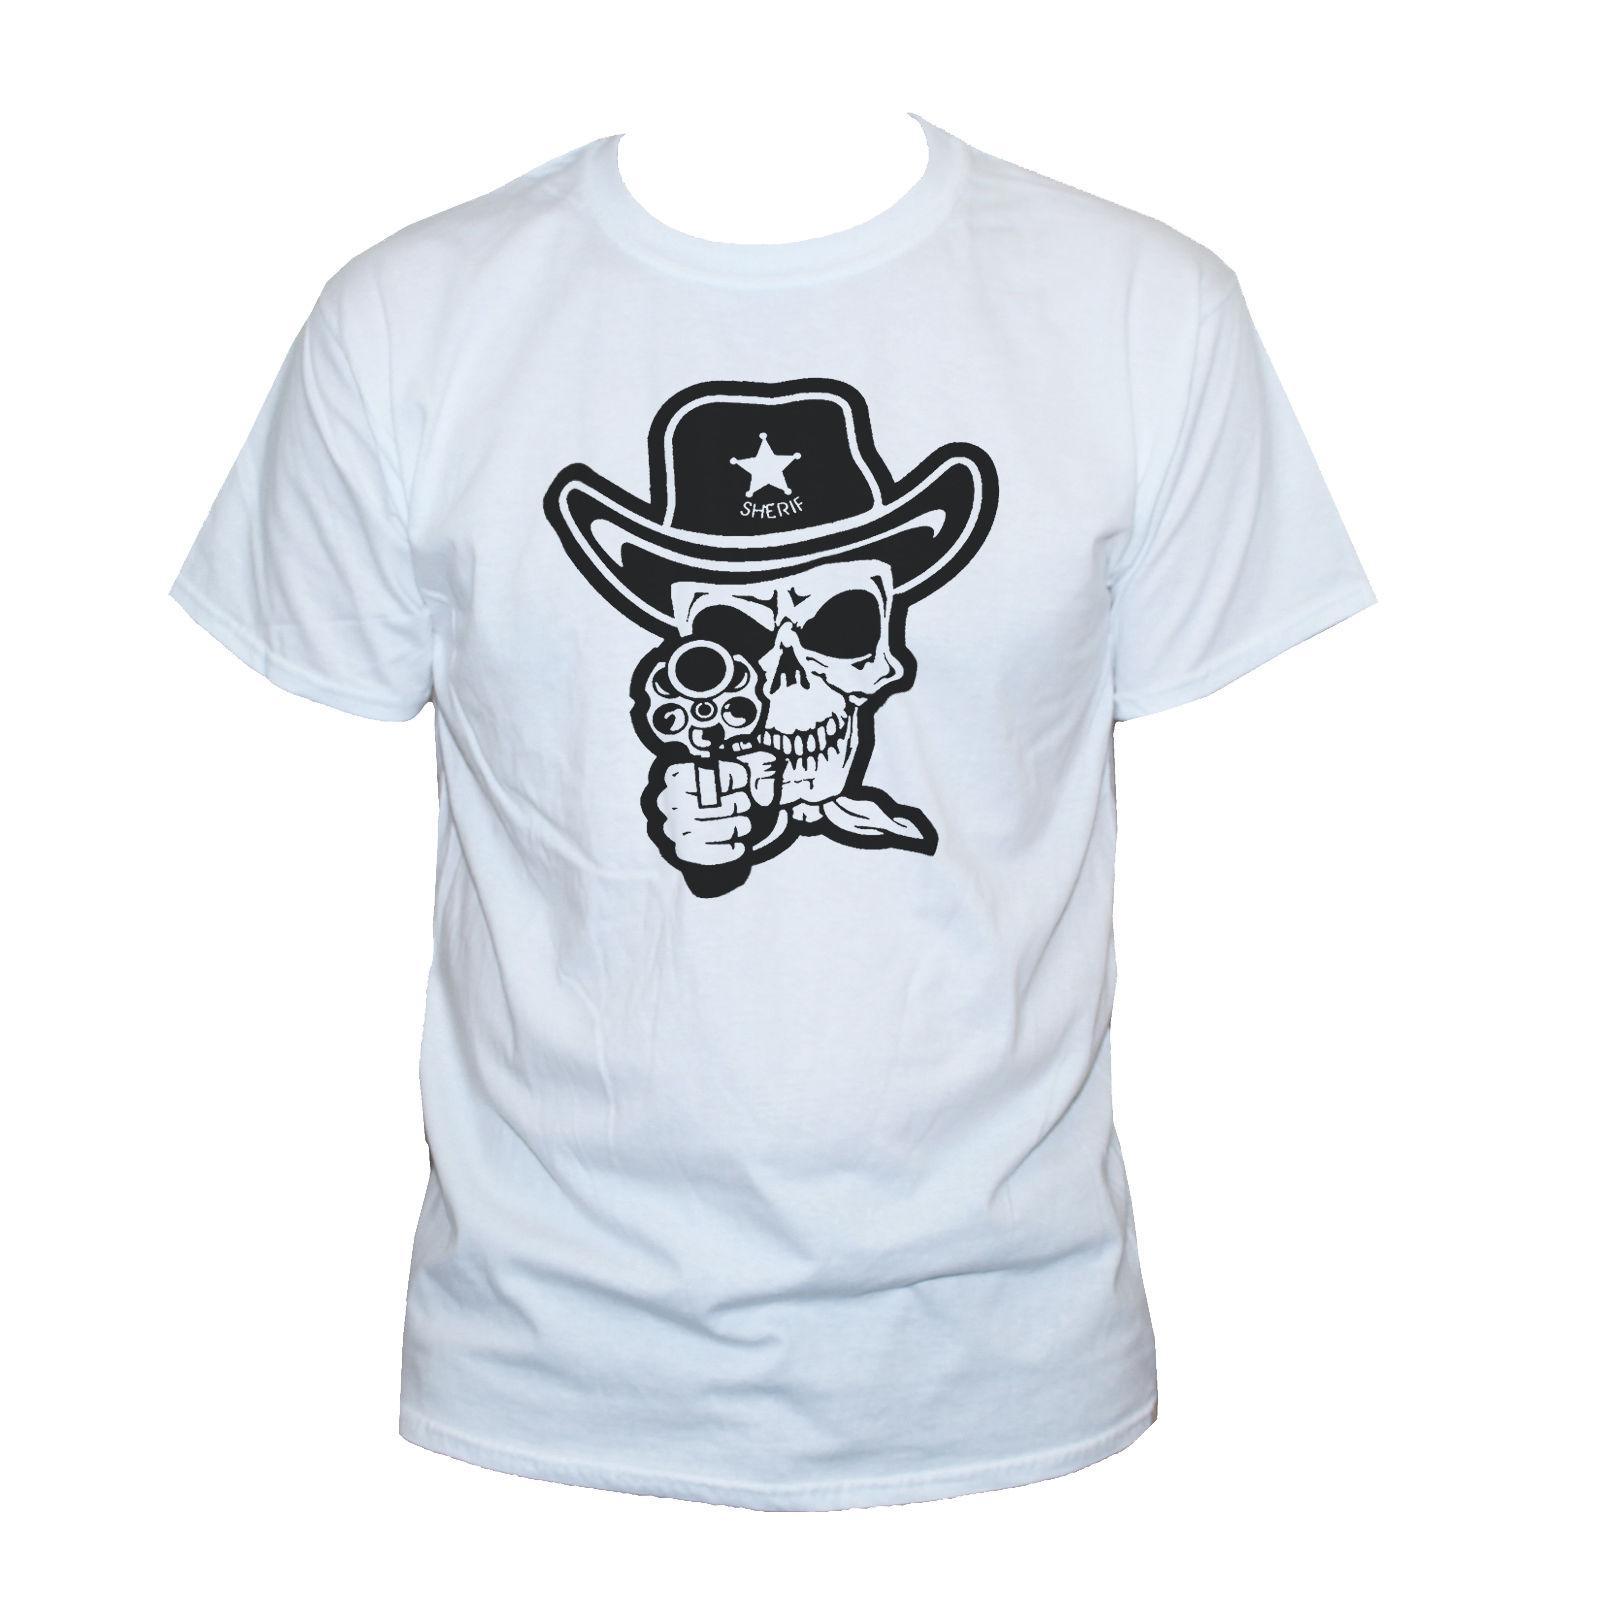 5c19e9141abe5 Sheriff Skull With Gun T-Shirt Rockabilly Punk Goth Graphic Retro Tee  UnisexFunny free shipping Unisex Casual Tshirt